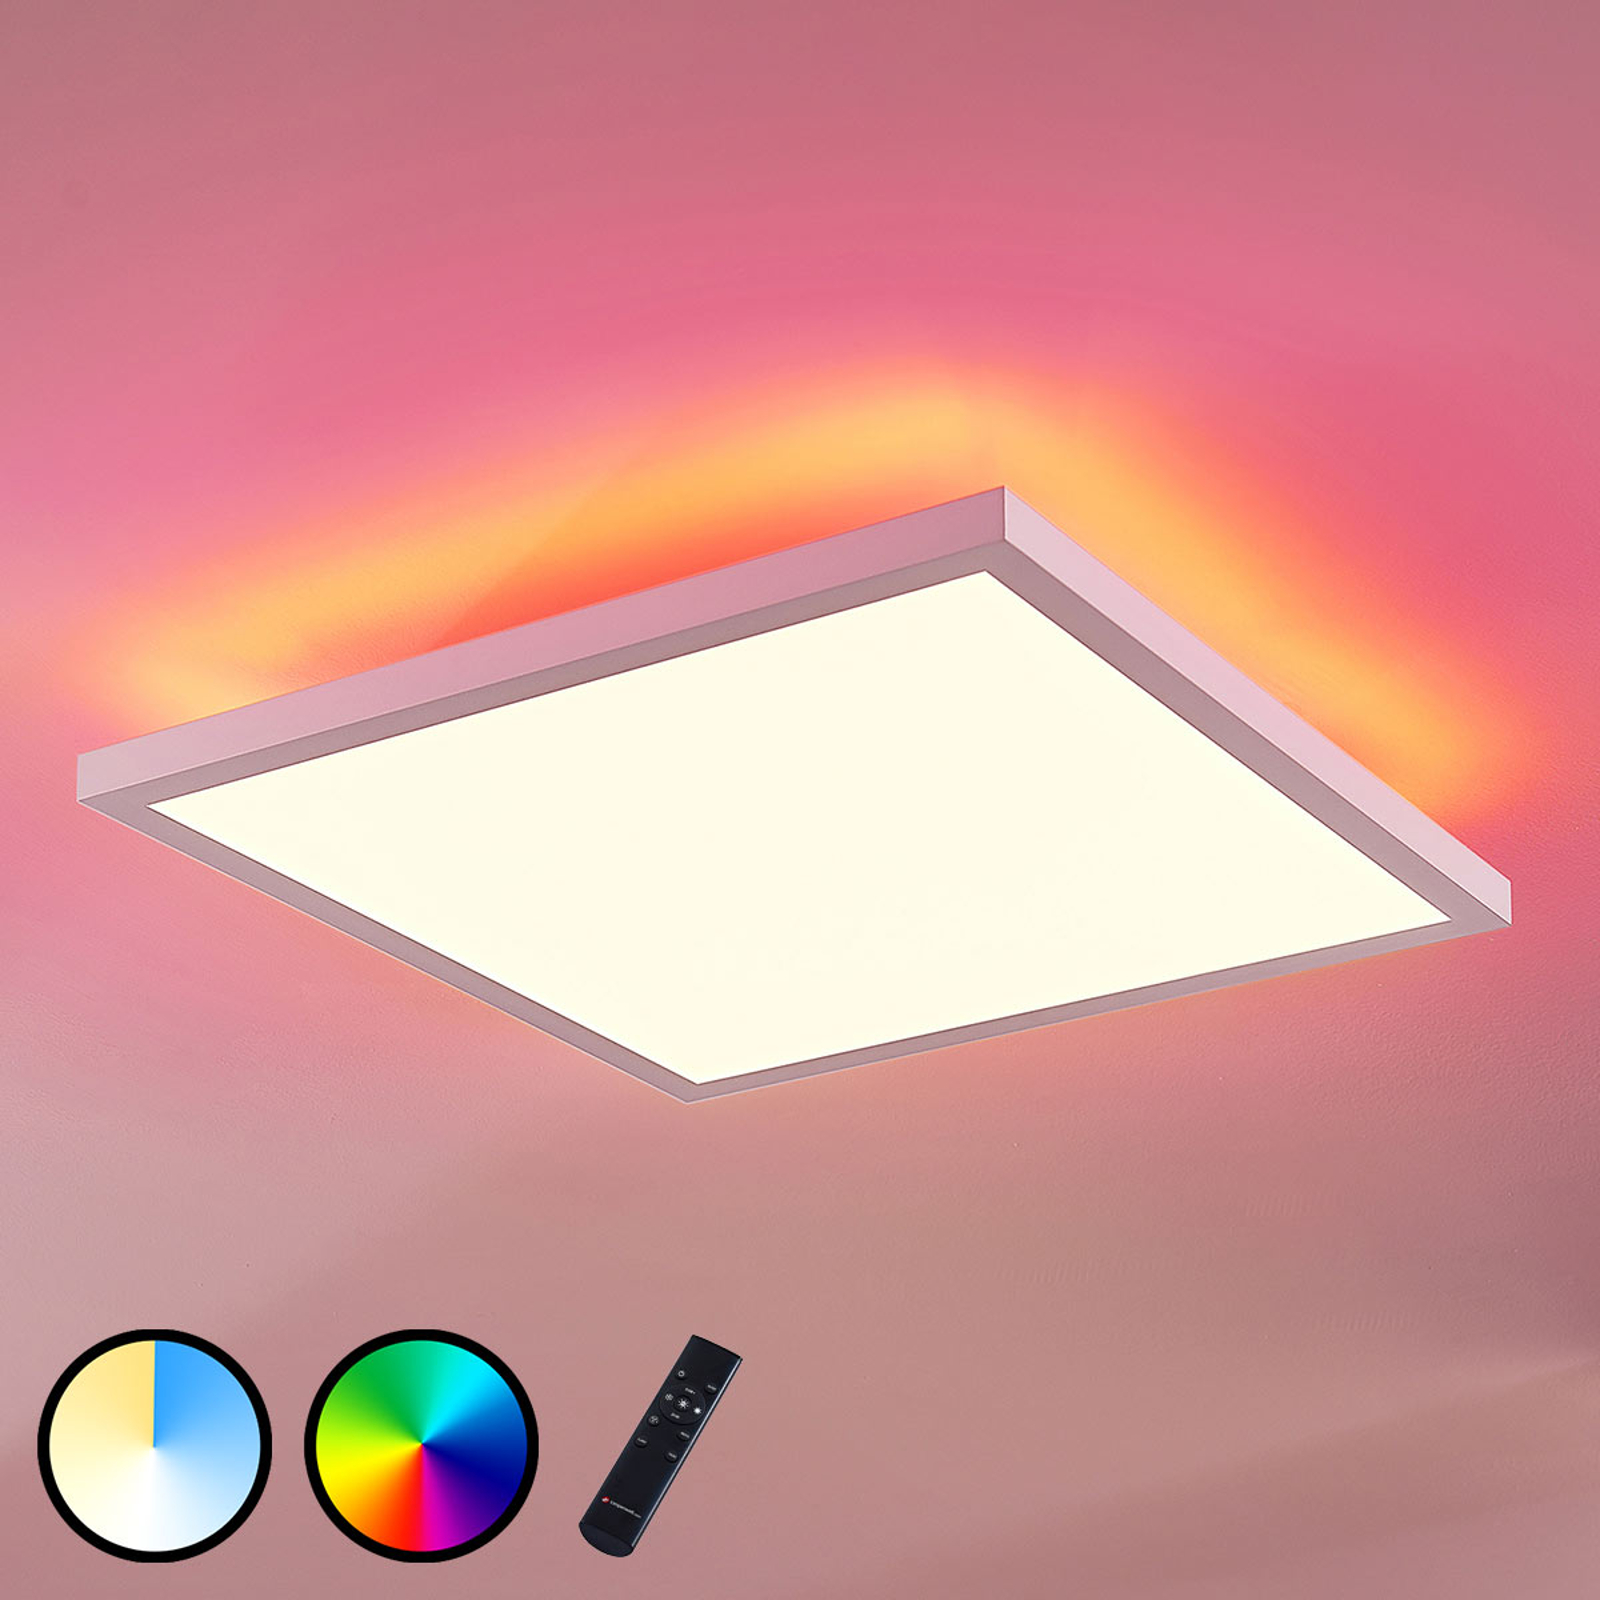 LED panel Brenda CCT with remote, 40 x 40 cm_9624204_1